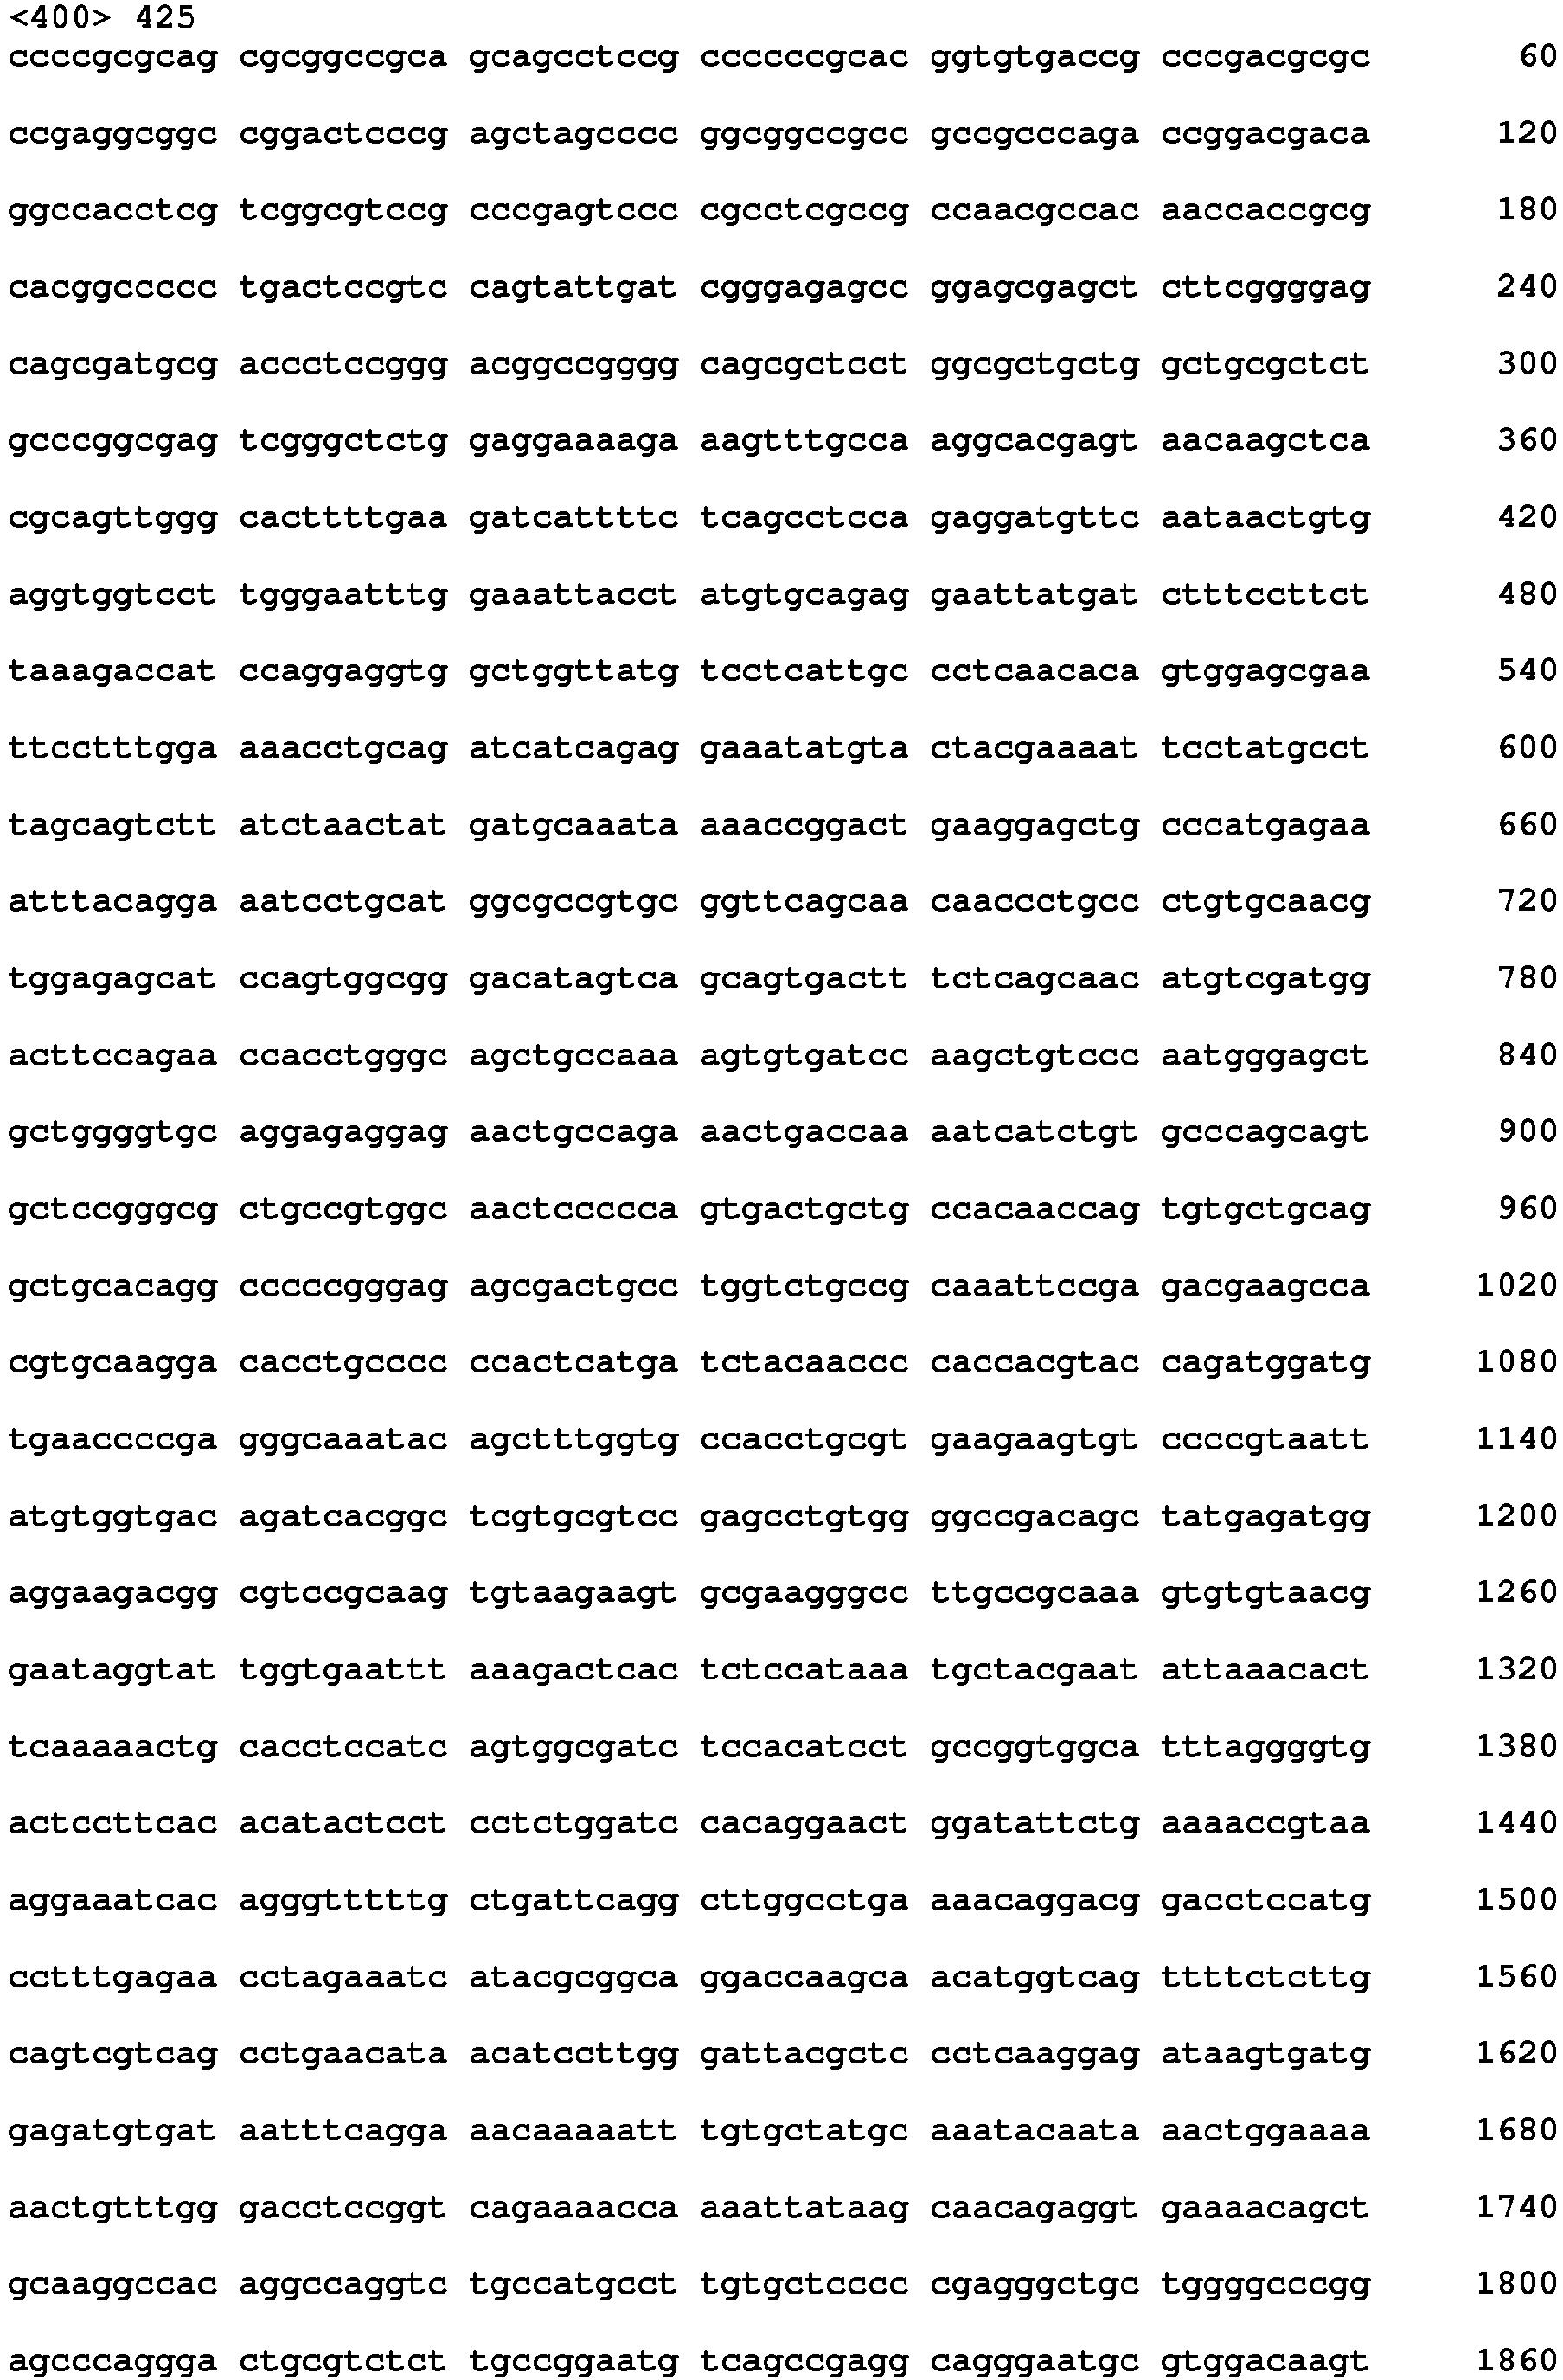 Figure imgb0068